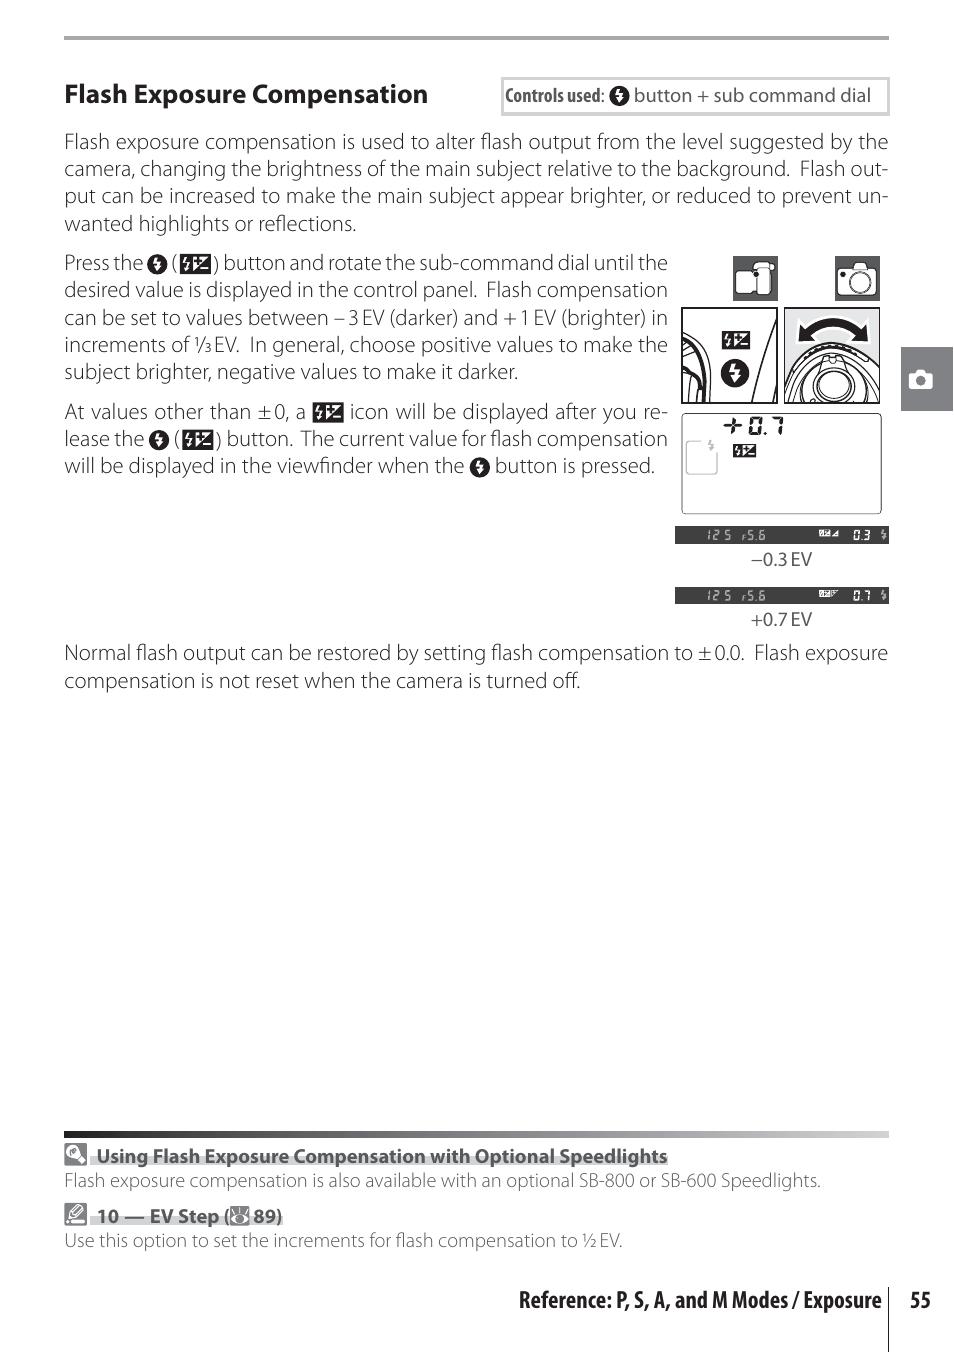 flash exposure compensation nikon d80 user manual page 67 162 rh manualsdir com canon d80 user manual neato d80 user manual